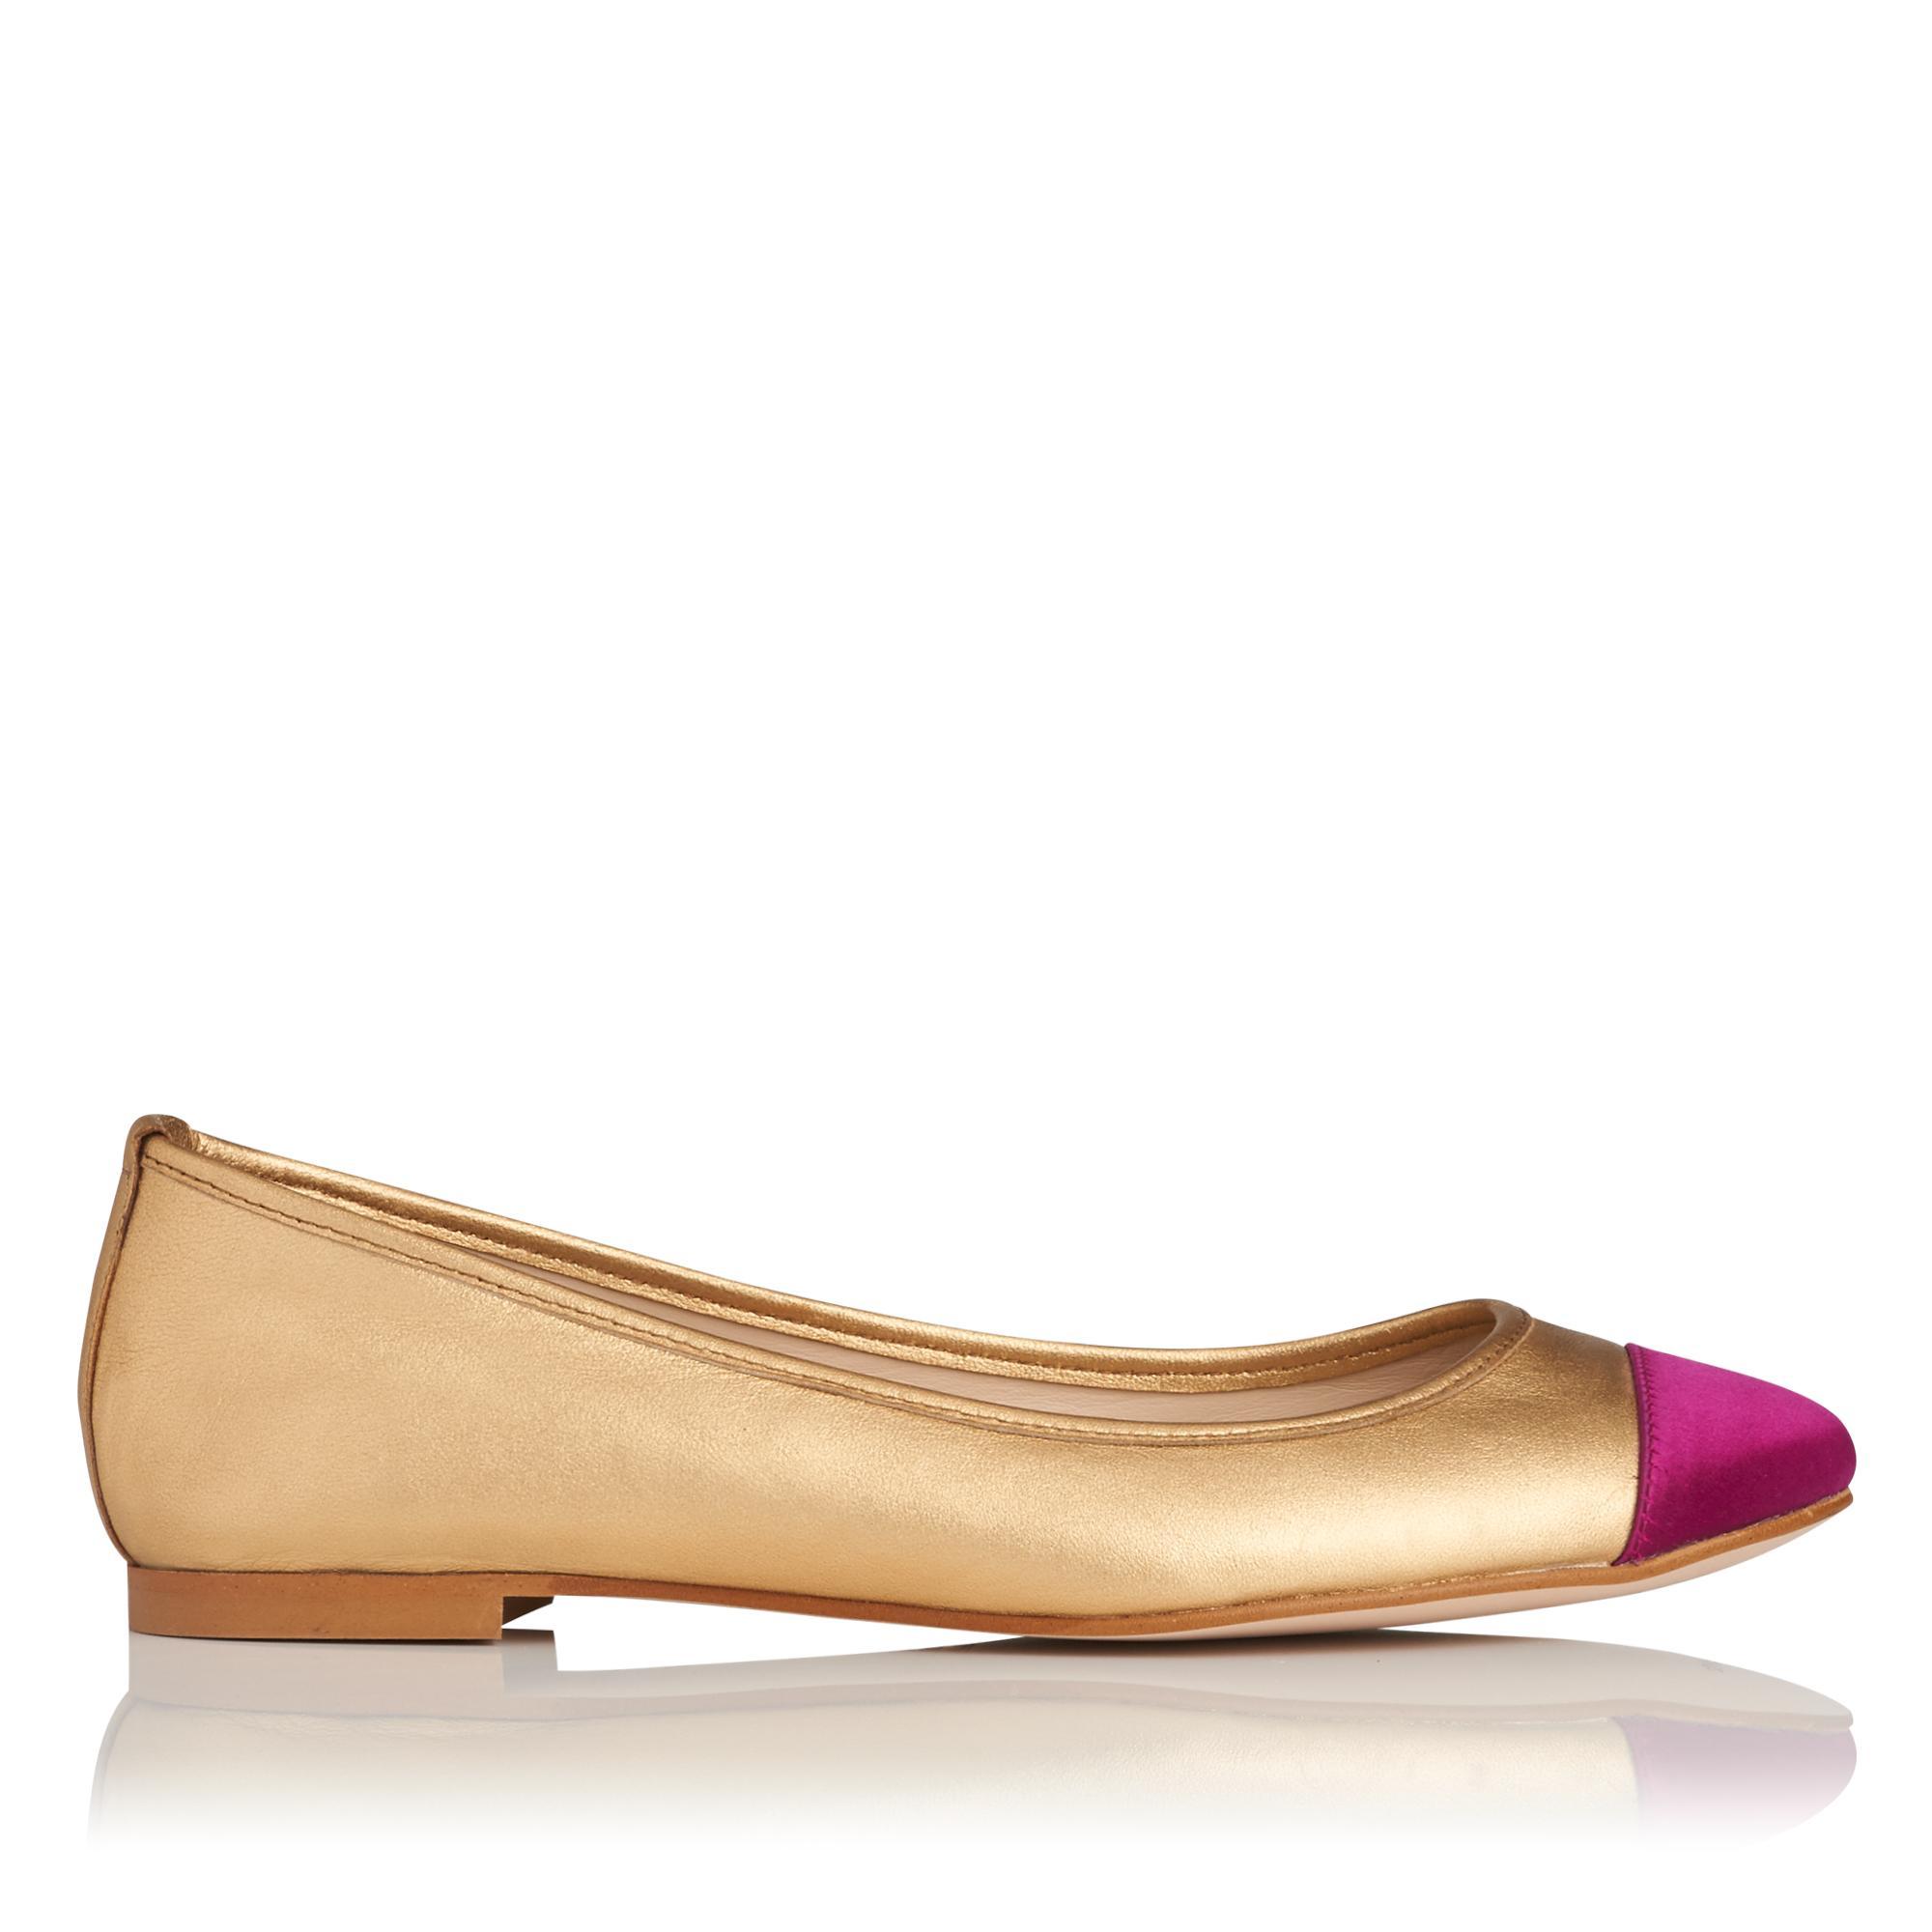 Suzanne Gold Ballet Flat